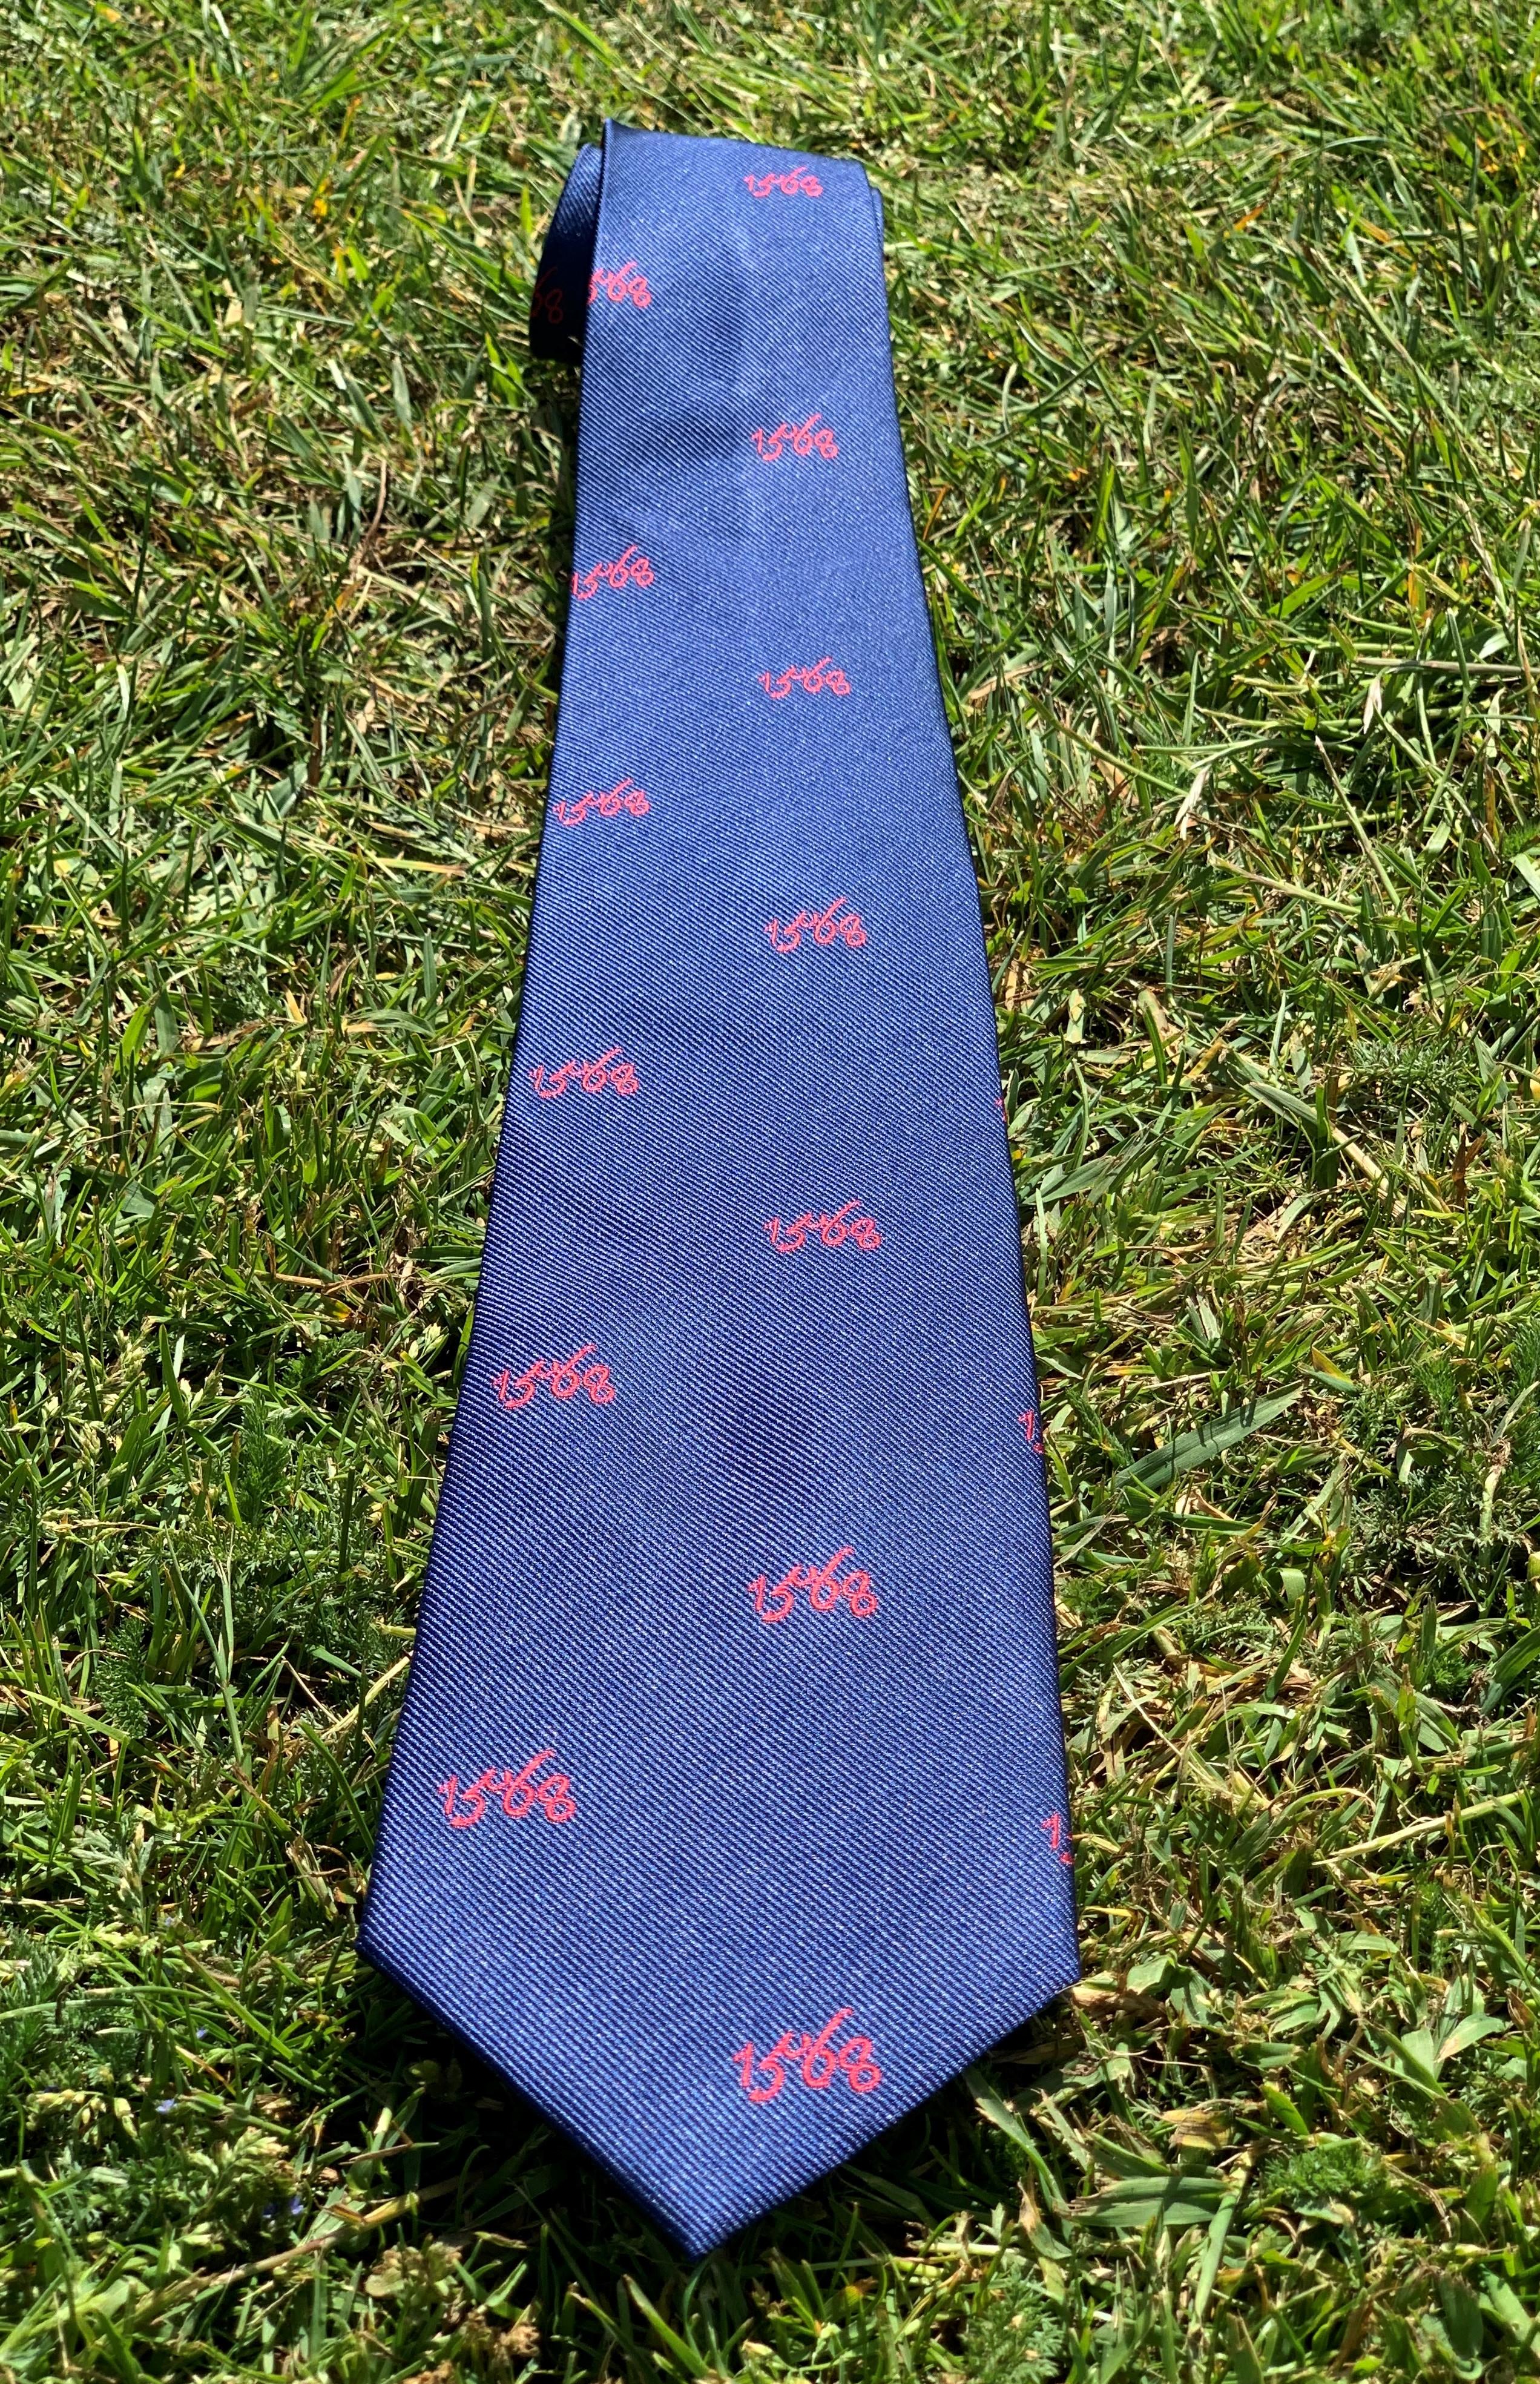 450th Anniversary tie